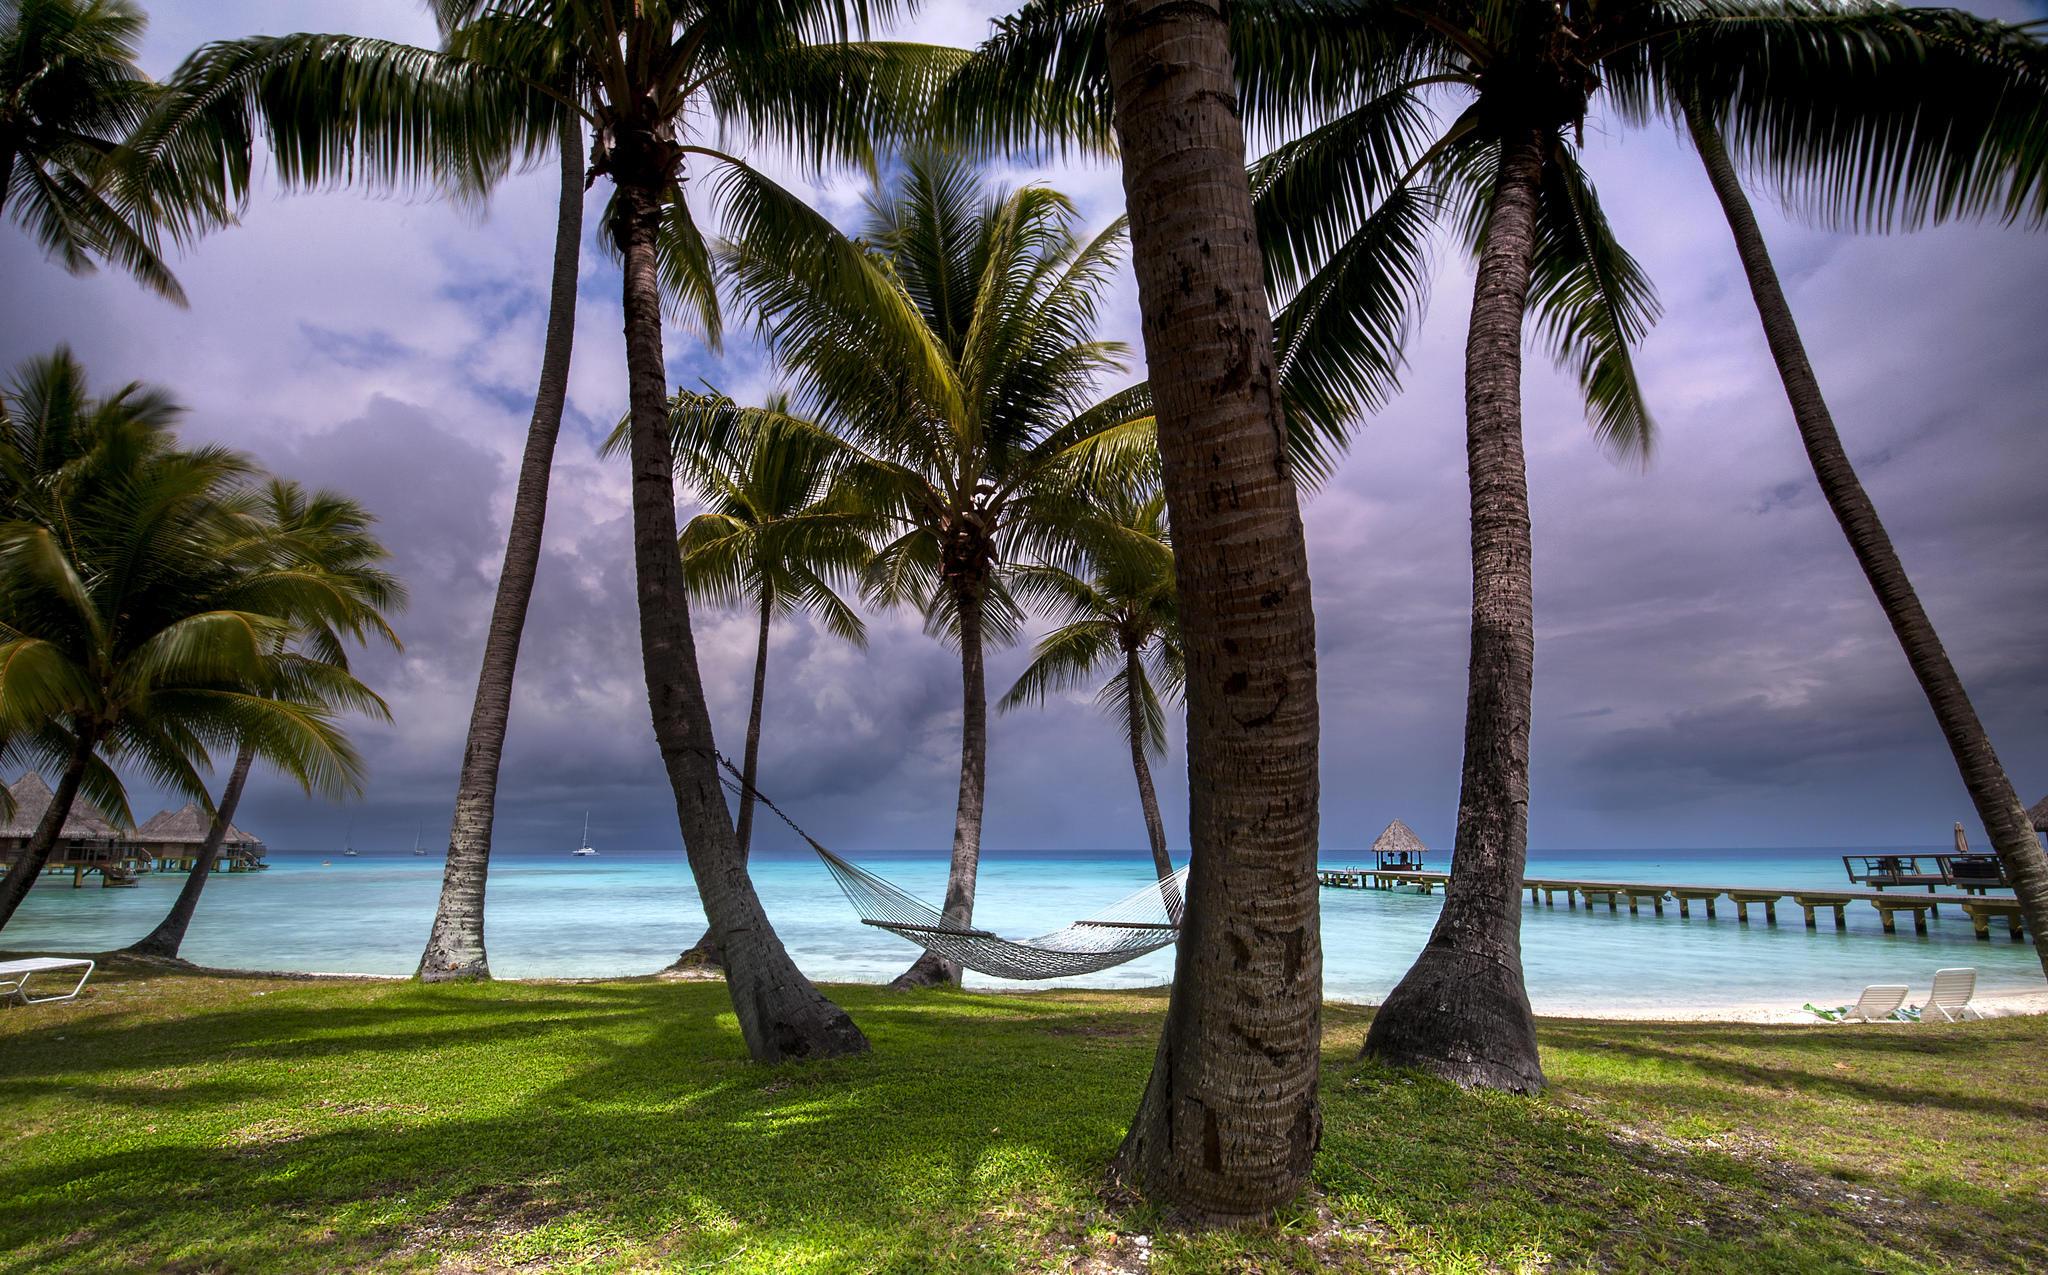 Rangiroa, Tuamotu Islands, French Polynesia  № 7026 загрузить